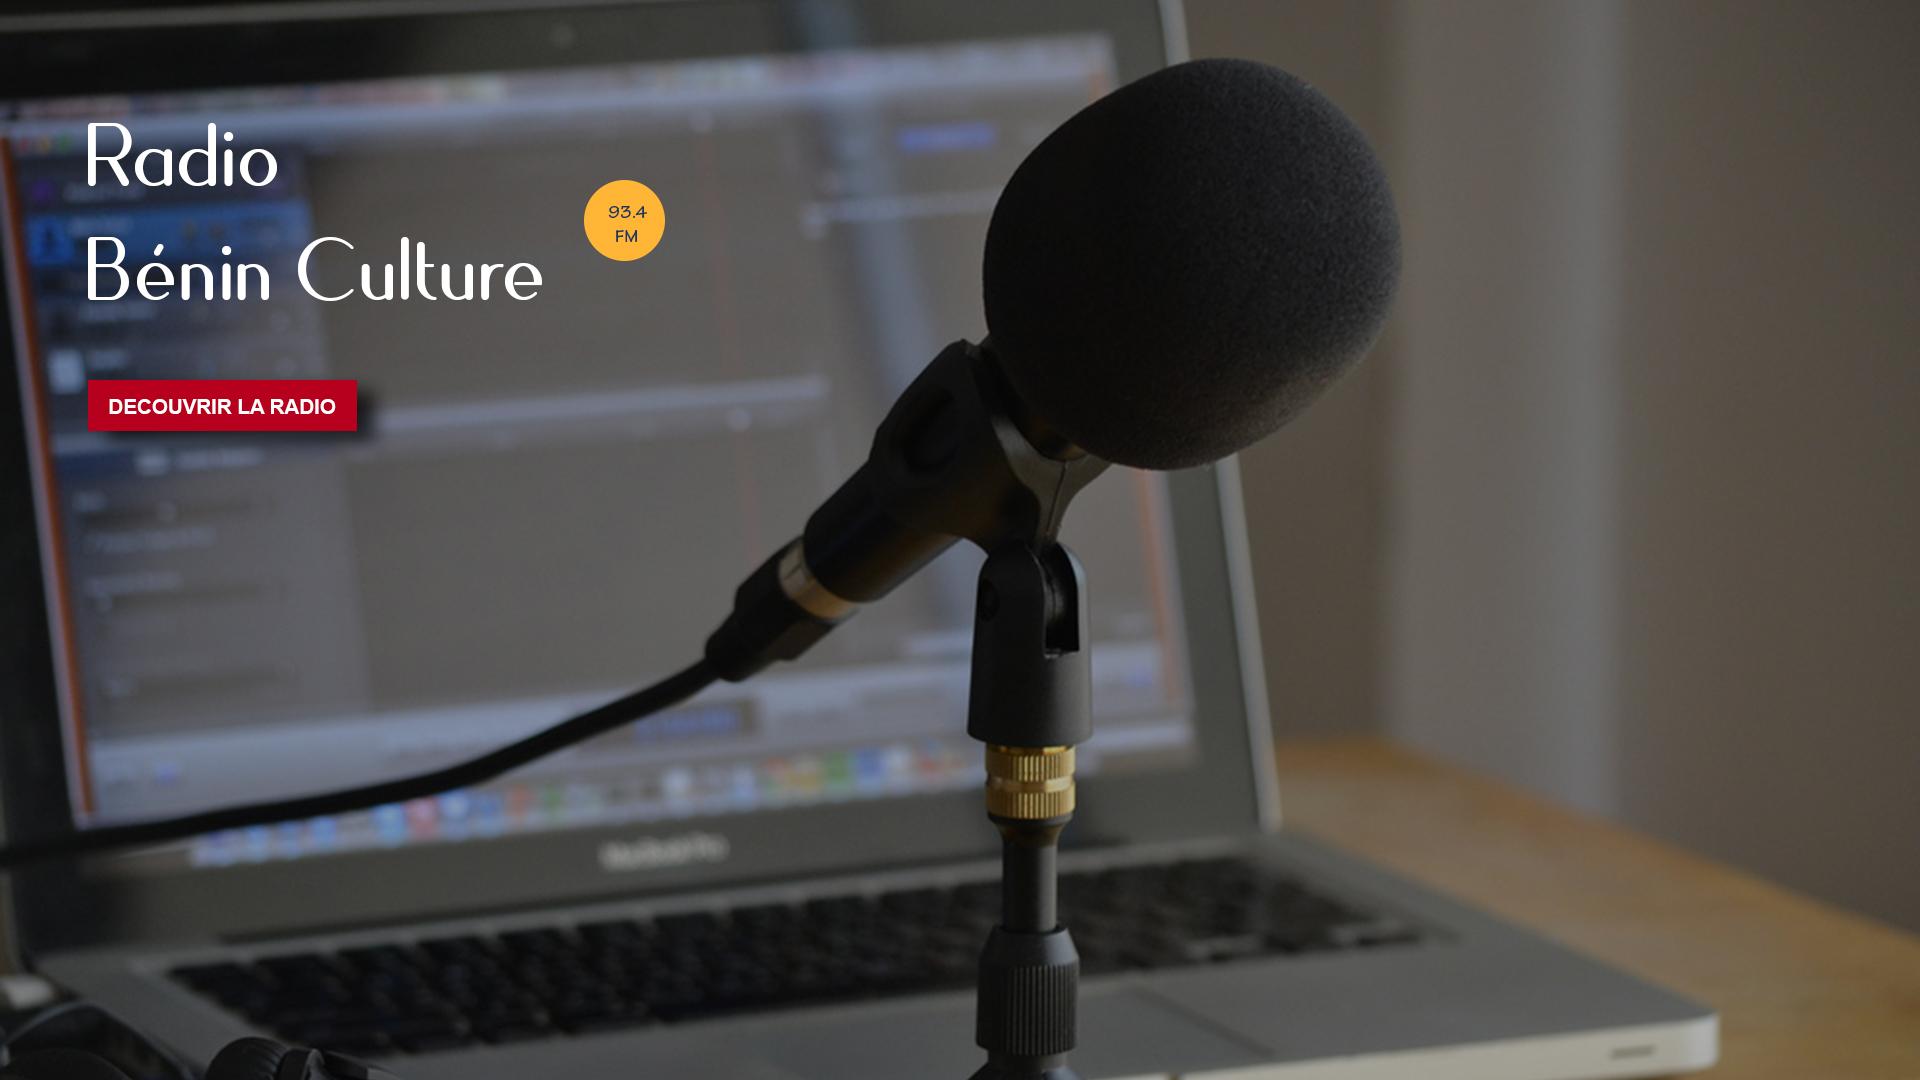 Bienvenue sur le portail de Radio Bénin Culture